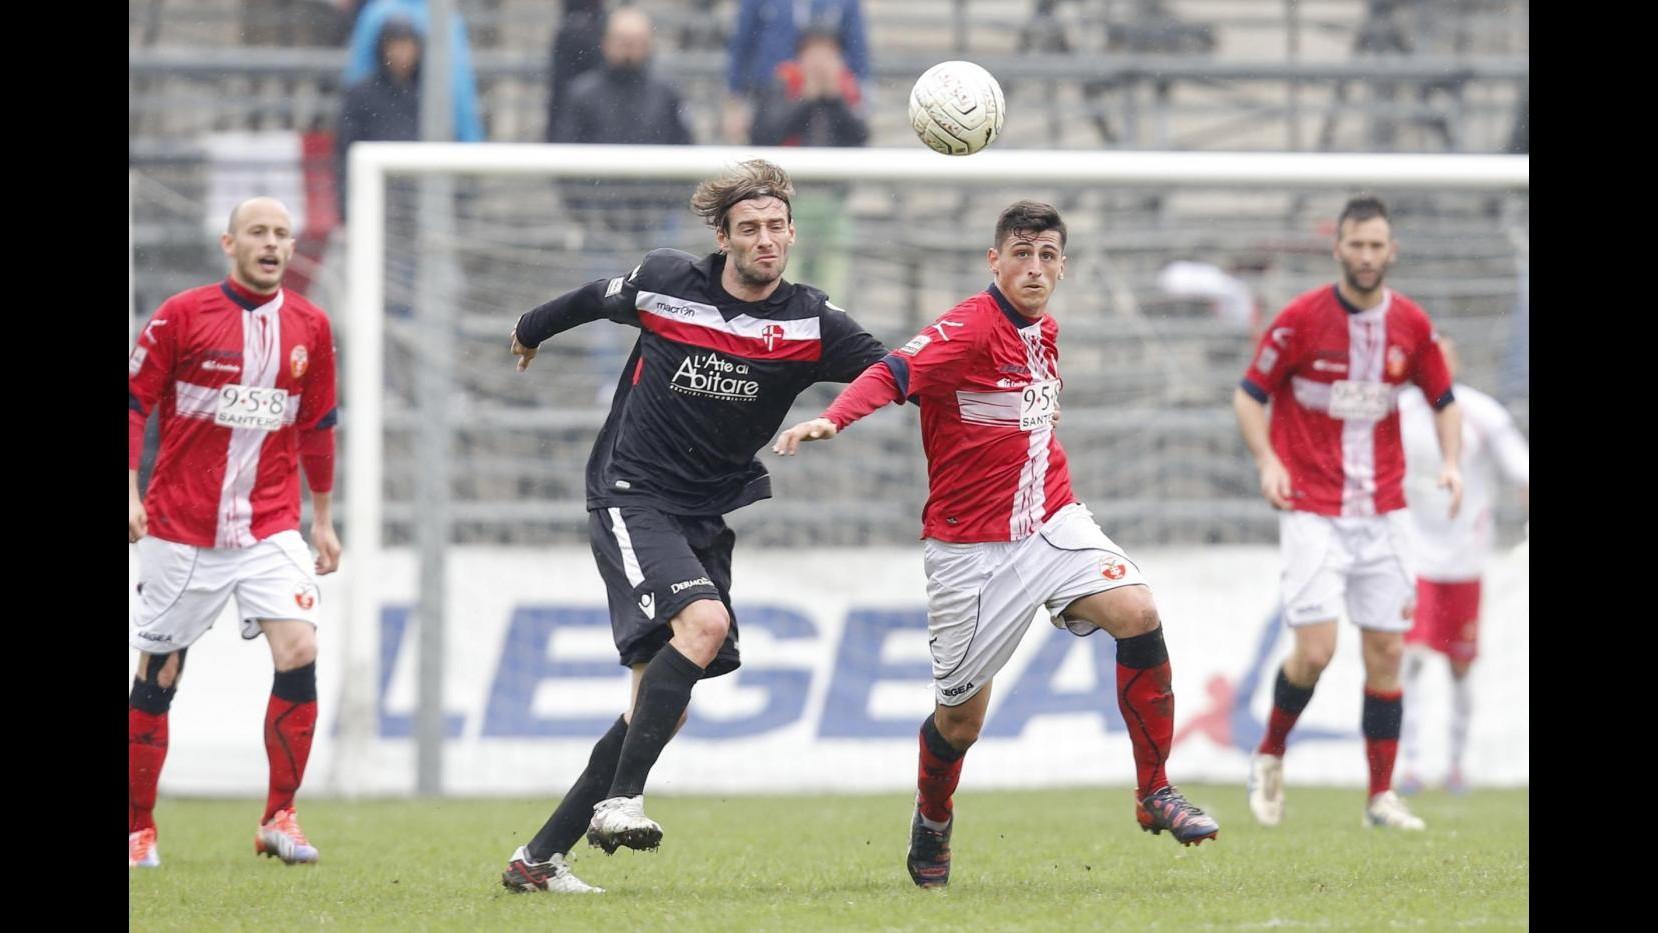 Lega Pro, Cuneo-Padova finisce 1-1